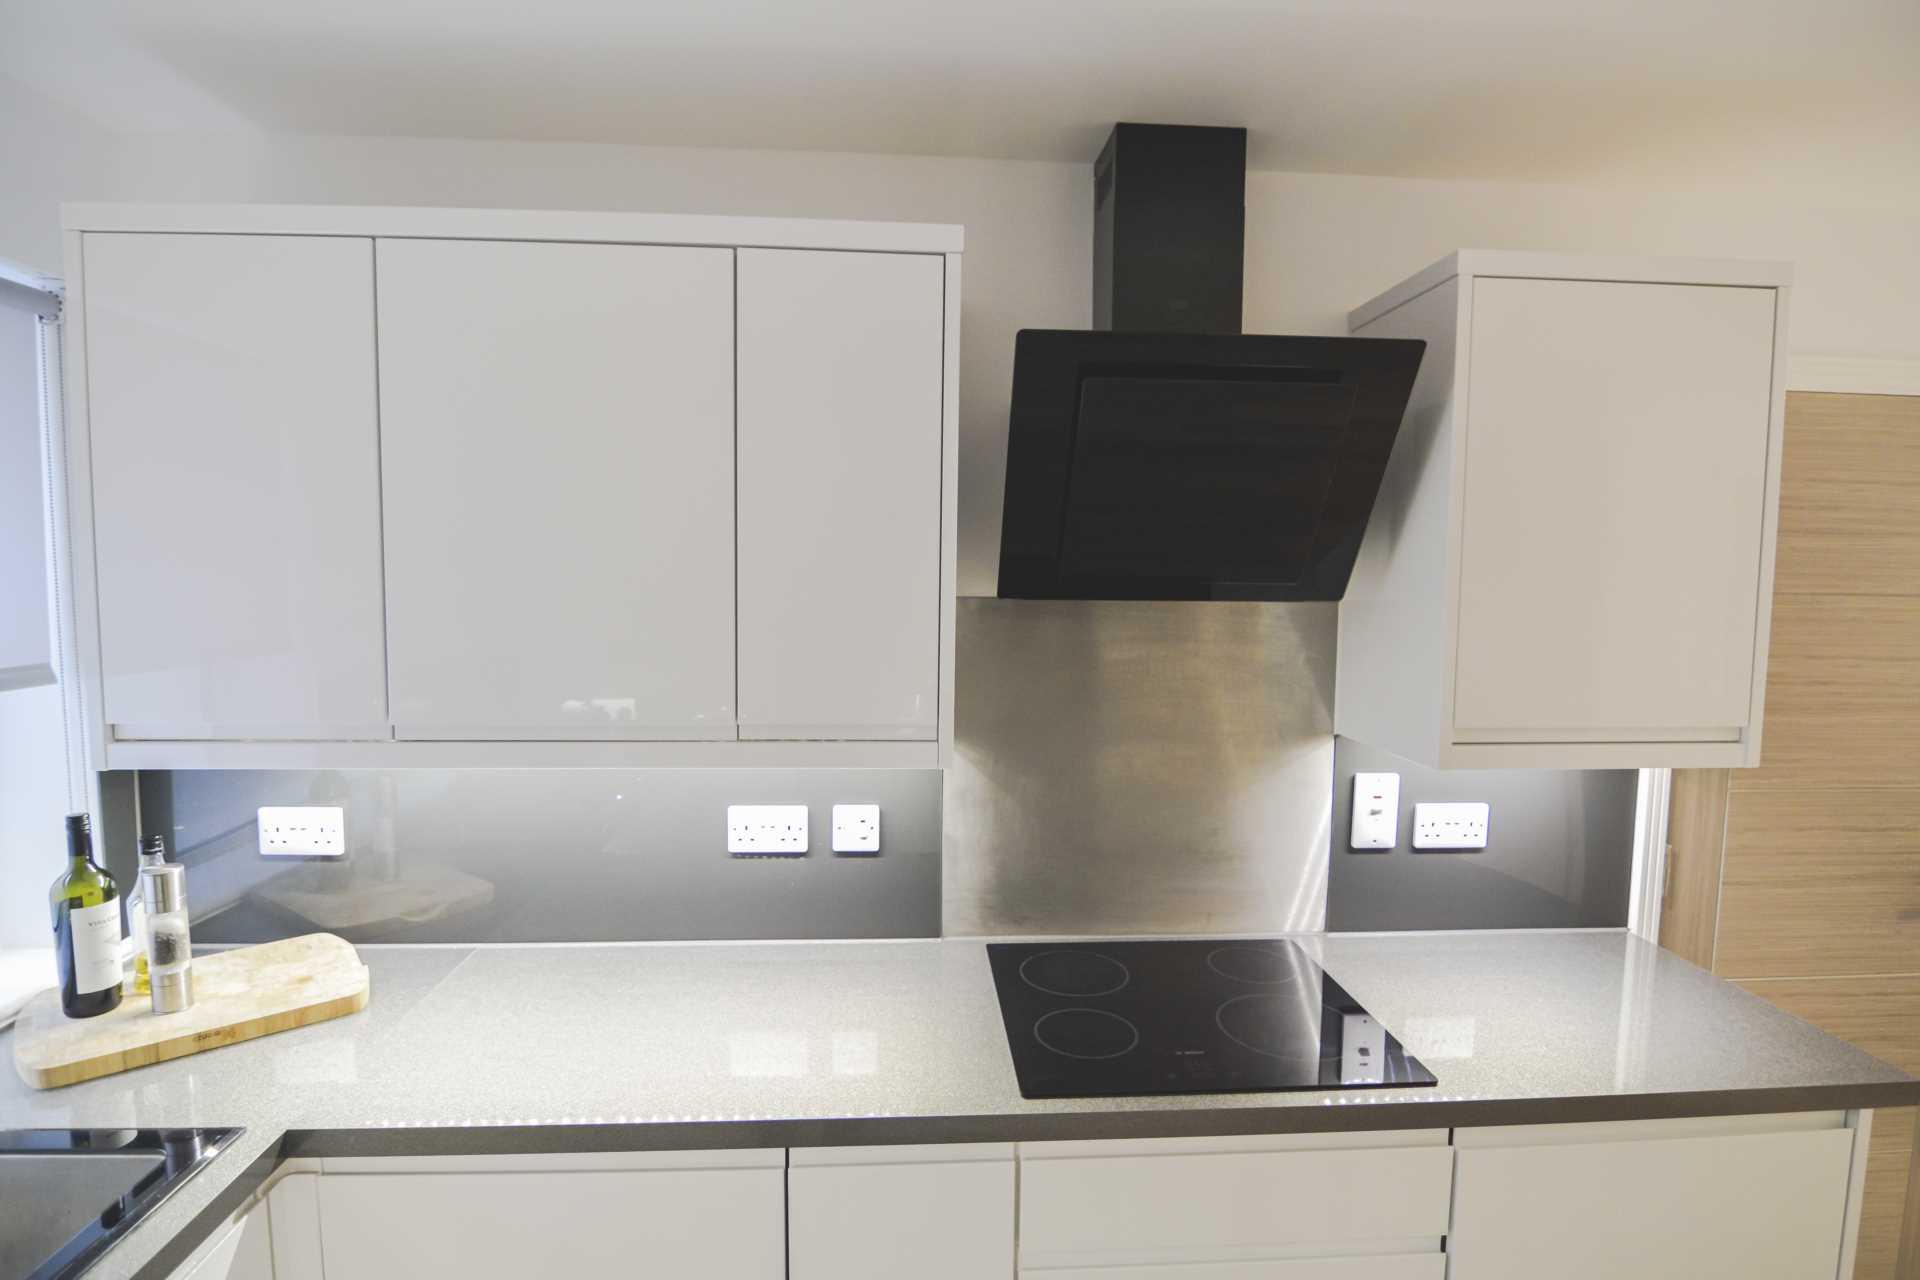 Flat 6, Waterloo Apartments, Image 6